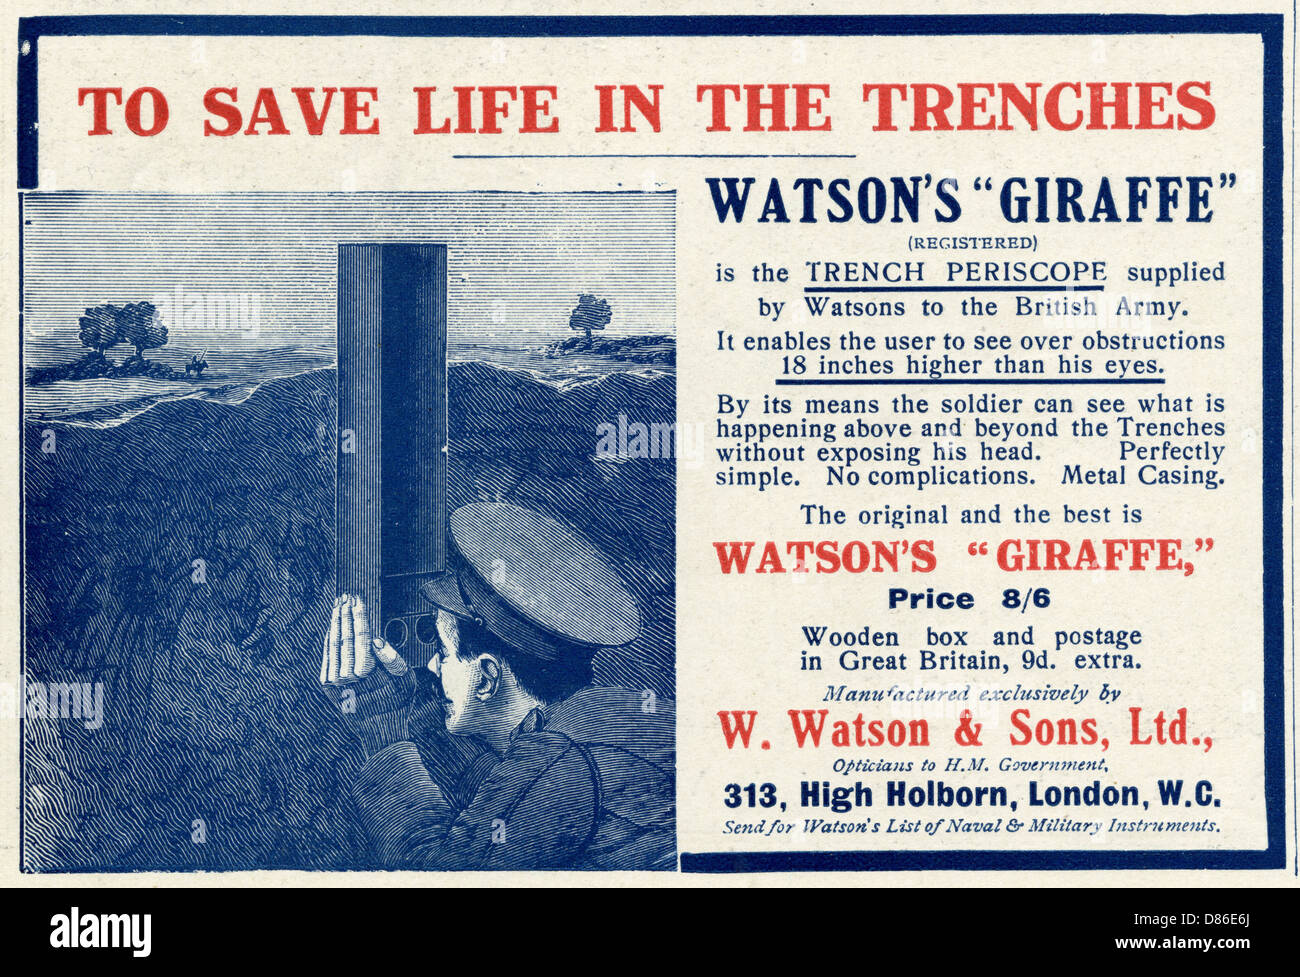 Advert For Watsons Giraffe Trench Periscope 1915 - Stock Image